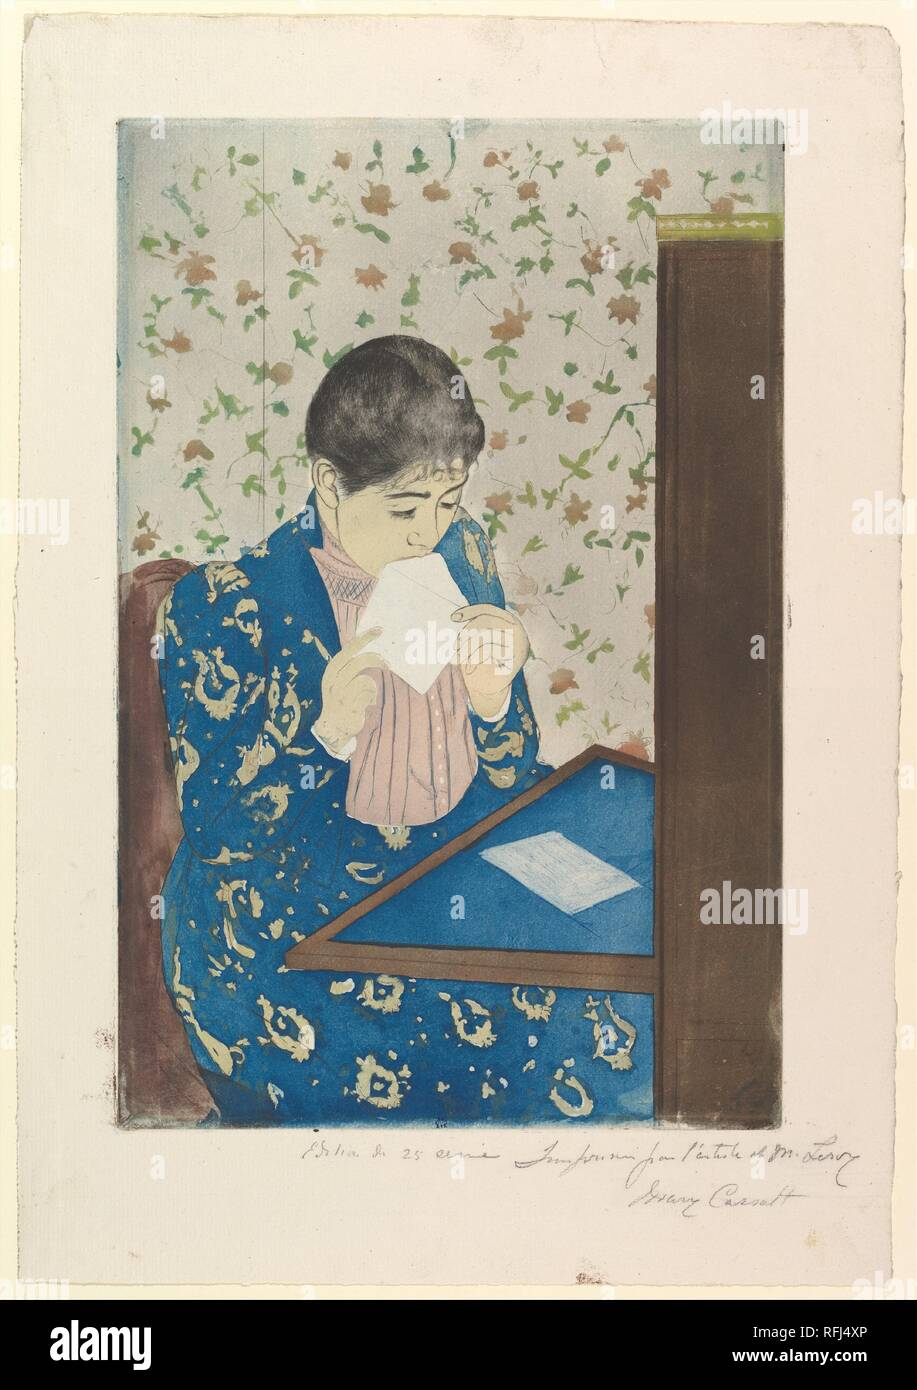 The Letter. Artist: Mary Cassatt (American, Pittsburgh, Pennsylvania 1844-1926 Le Mesnil-Théribus, Oise). Dimensions: plate: 13 5/8 x 8 15/16 in. (34.6 x 22.7 cm)  sheet: 17 x 11 3/4 in. (43.2 x 29.8 cm). Date: 1890-91. Museum: Metropolitan Museum of Art, New York, USA. Stock Photo